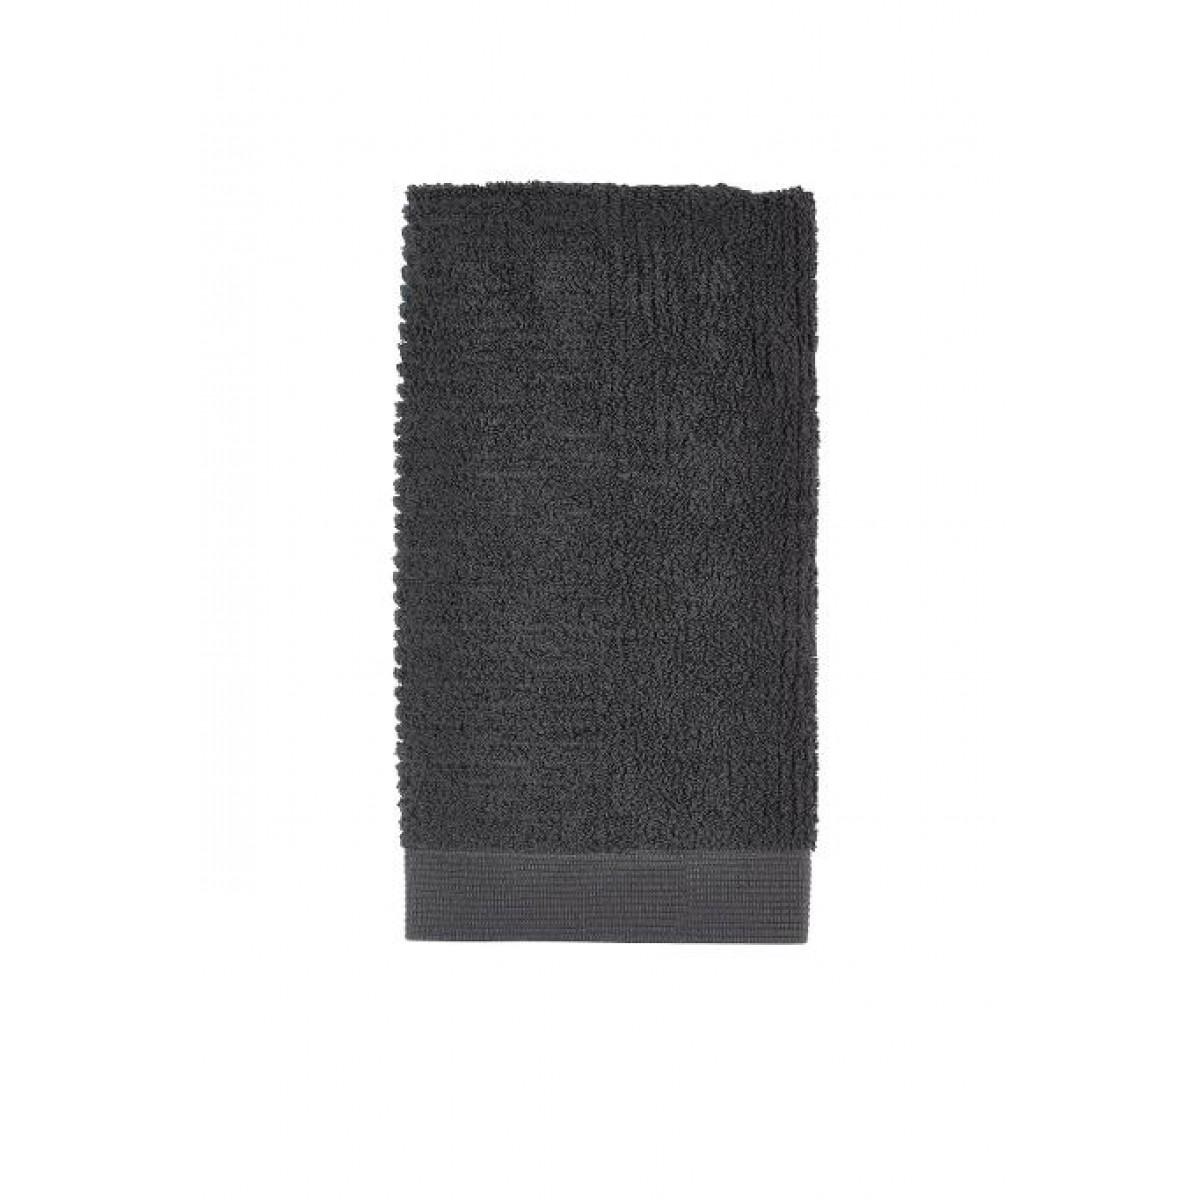 ZONE Classic håndklæde 50 x 100 cm. antracit grå